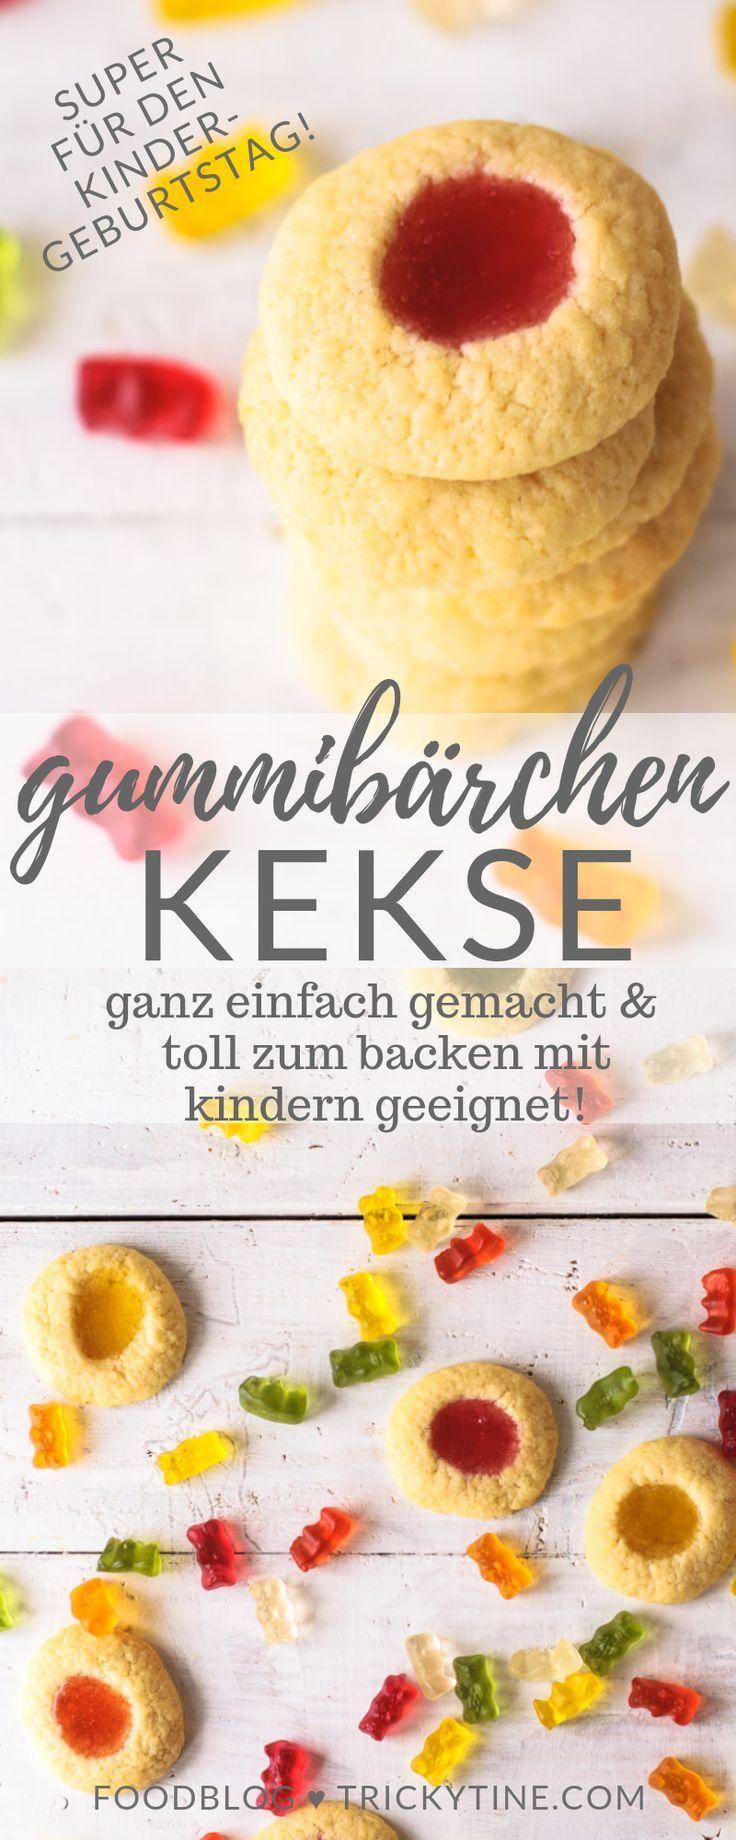 Gummibärchen-Kekse: das ultimative trickytine-Rezept - trickytine #rezepteherbst